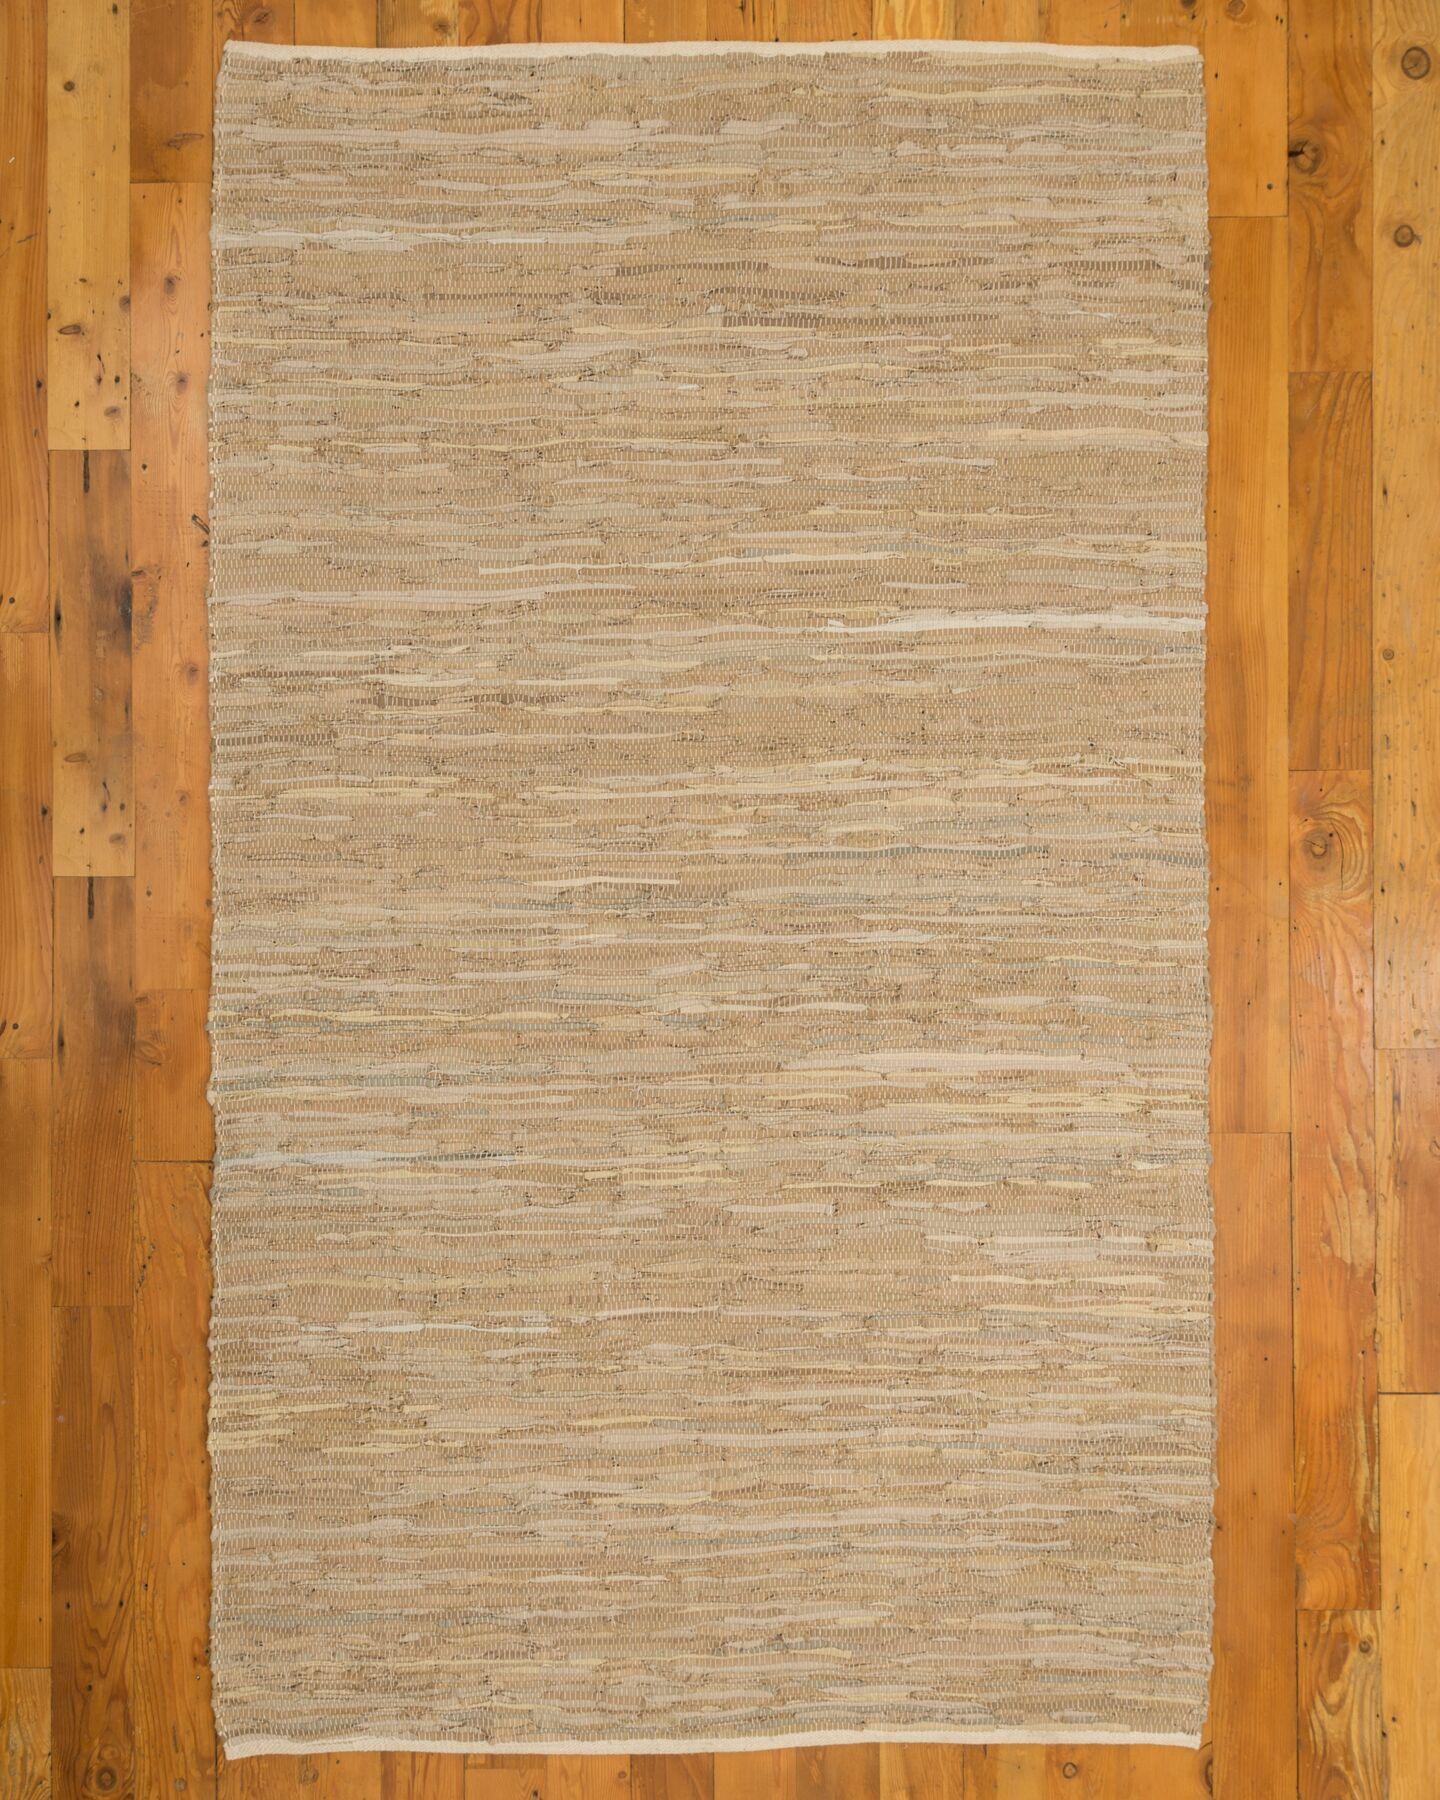 Brisco Handmade Beige Area Rug Rug Size: Rectangle 5' x 8'